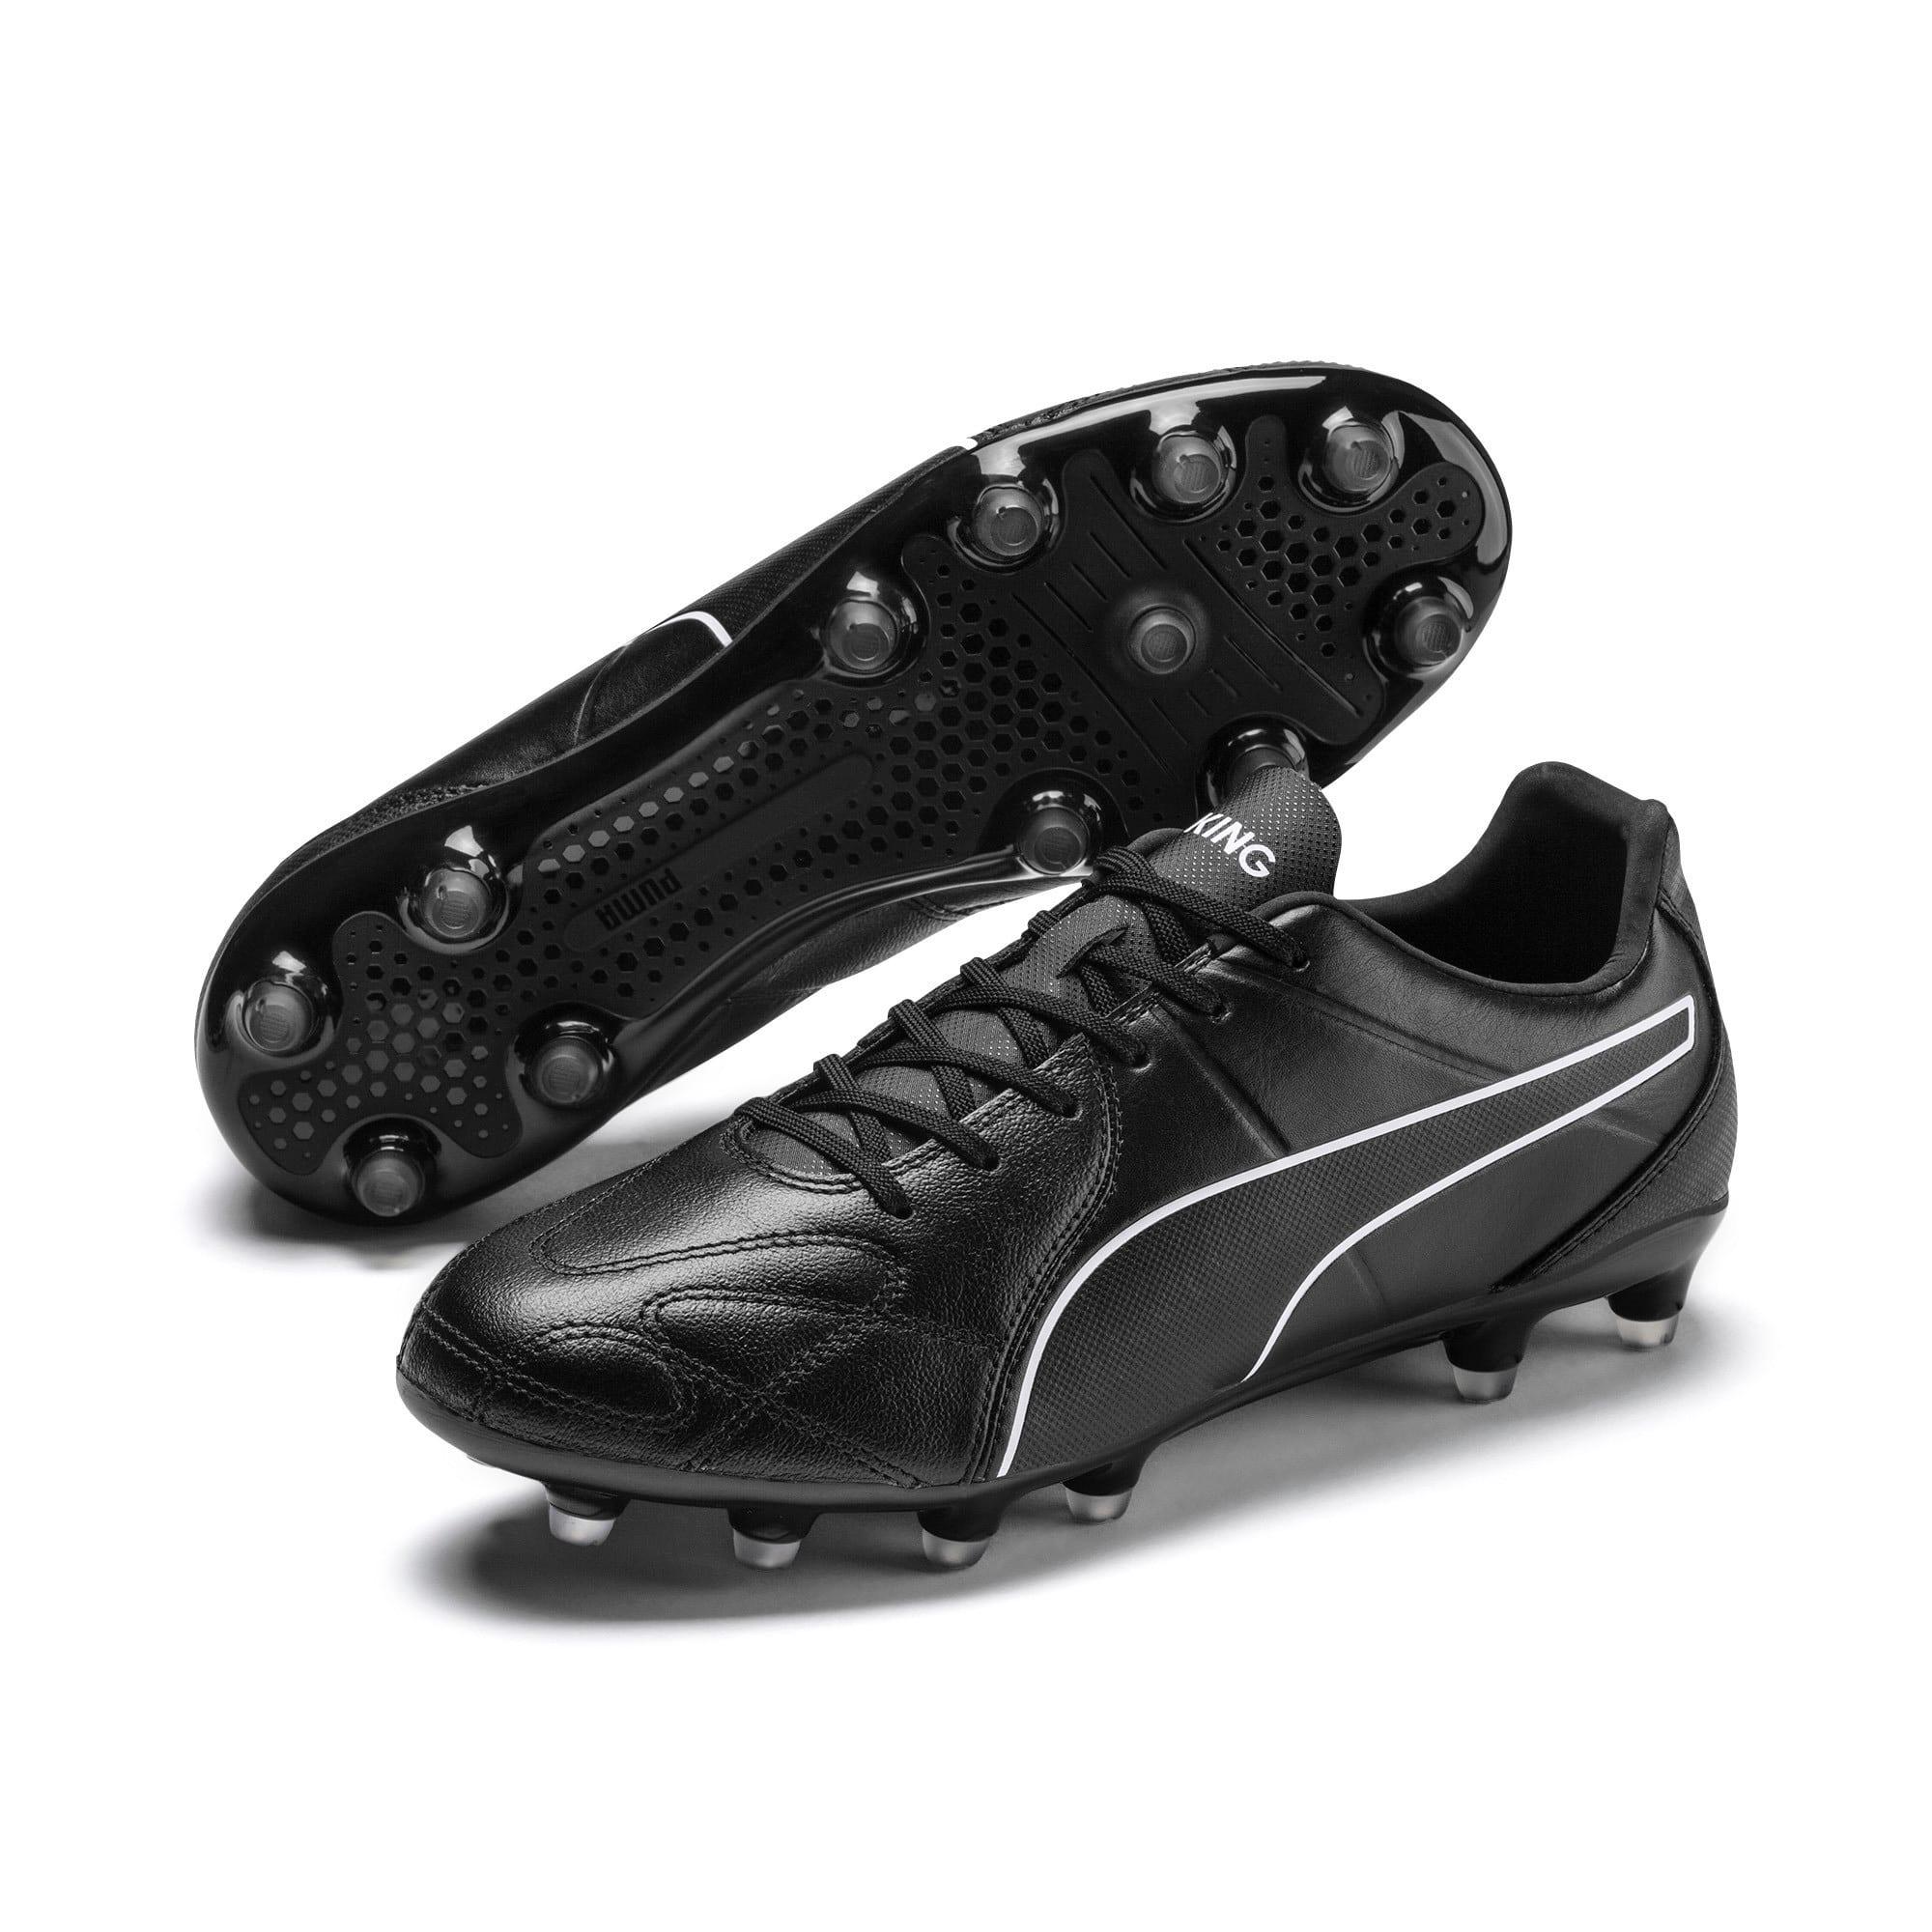 Thumbnail 4 of KING Hero FG Football Boots, Puma Black-Puma White, medium-IND